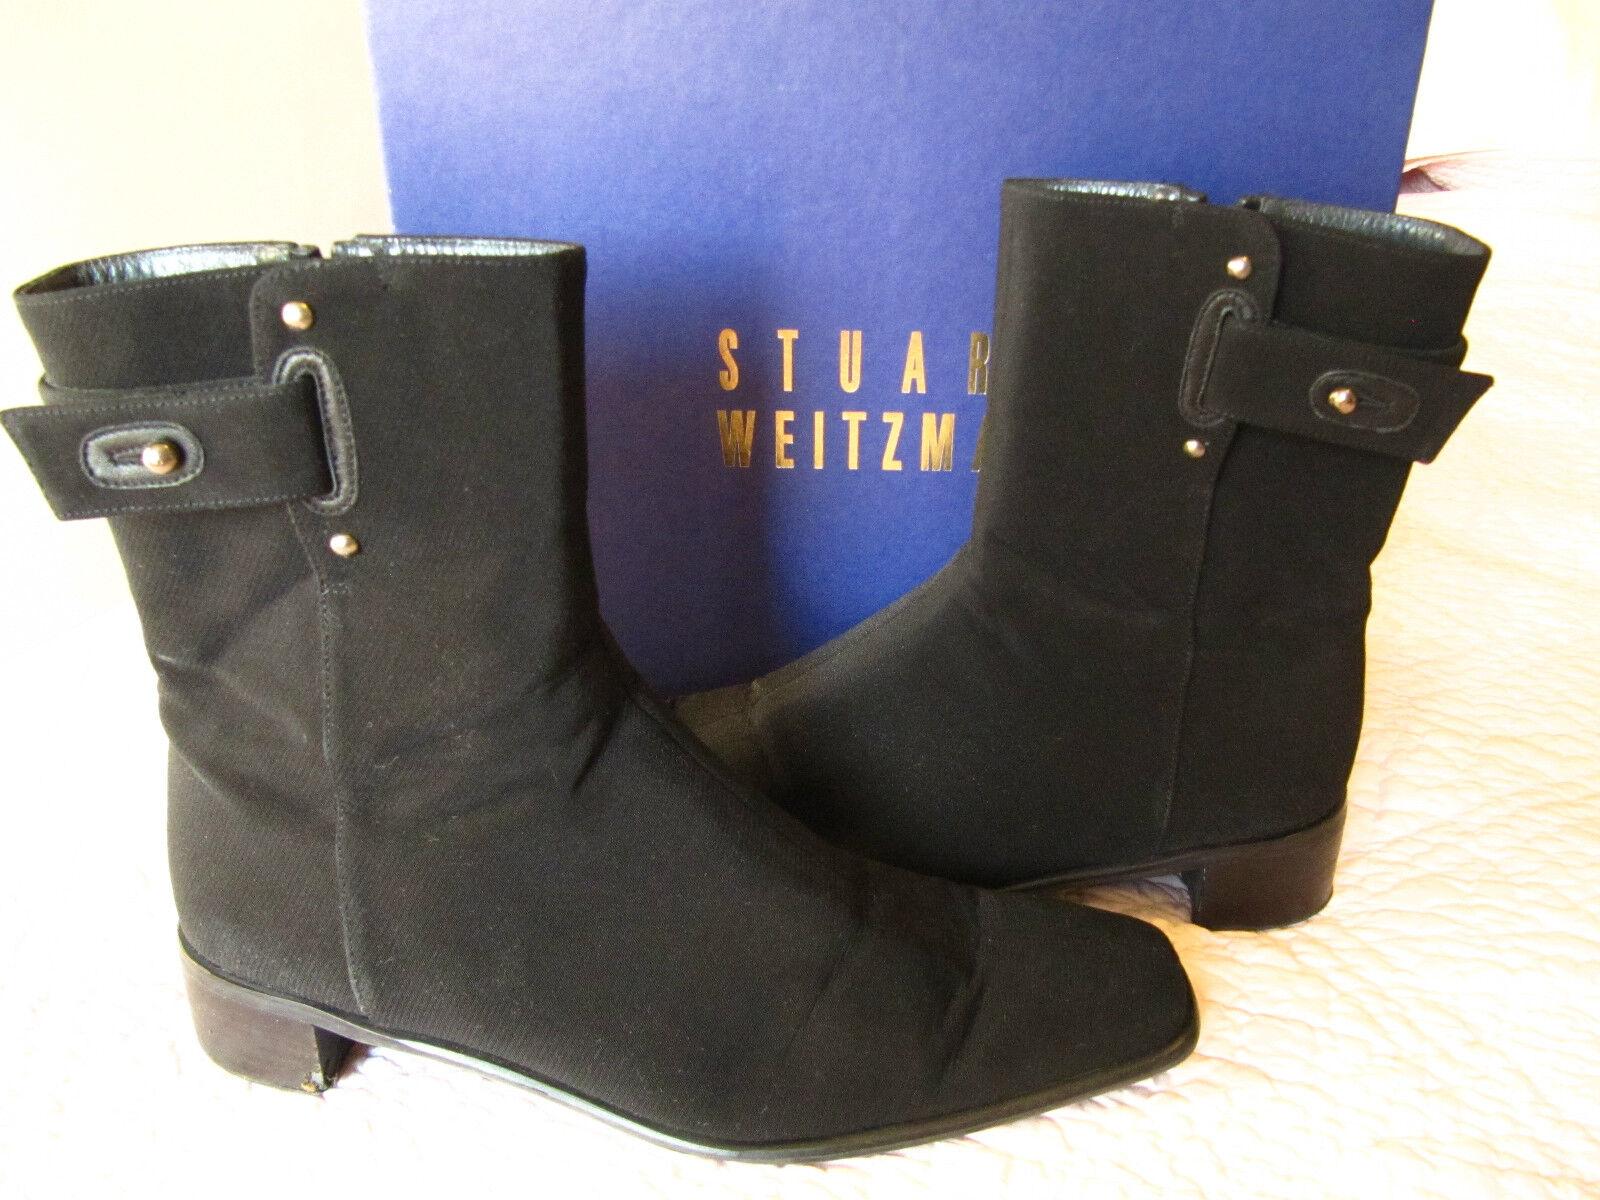 Stuart Weitzman ladies black fabric dress boots sz 8.5  299 1.5 inch heels